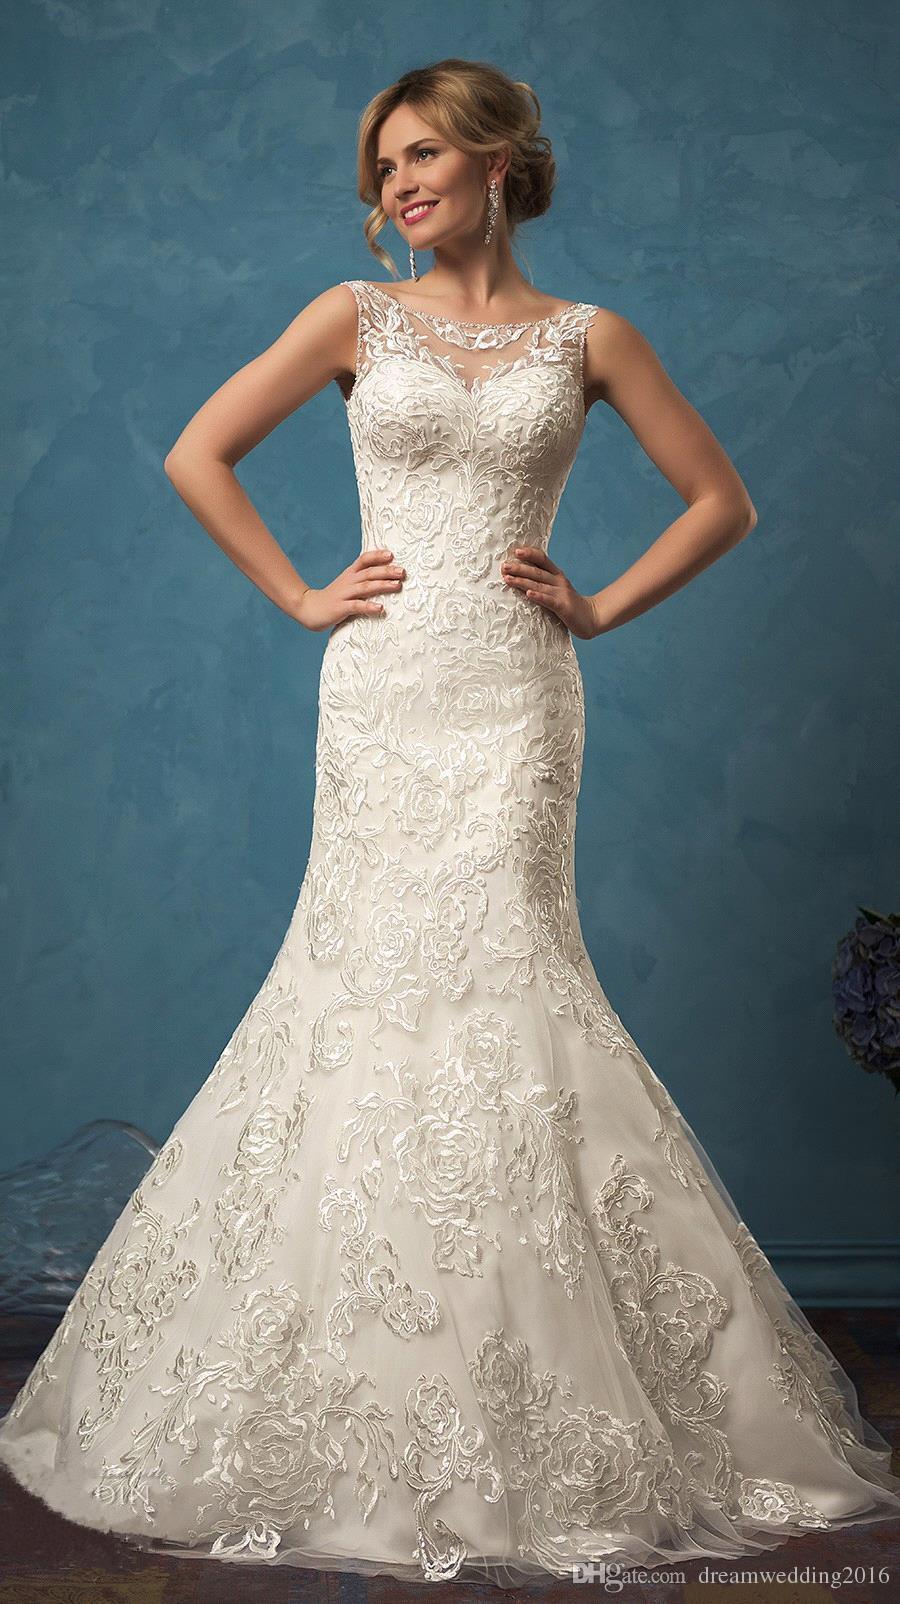 2017 New Amelia Sposa Wedding Dresses Vintage Lace Mermaid Bridal ...